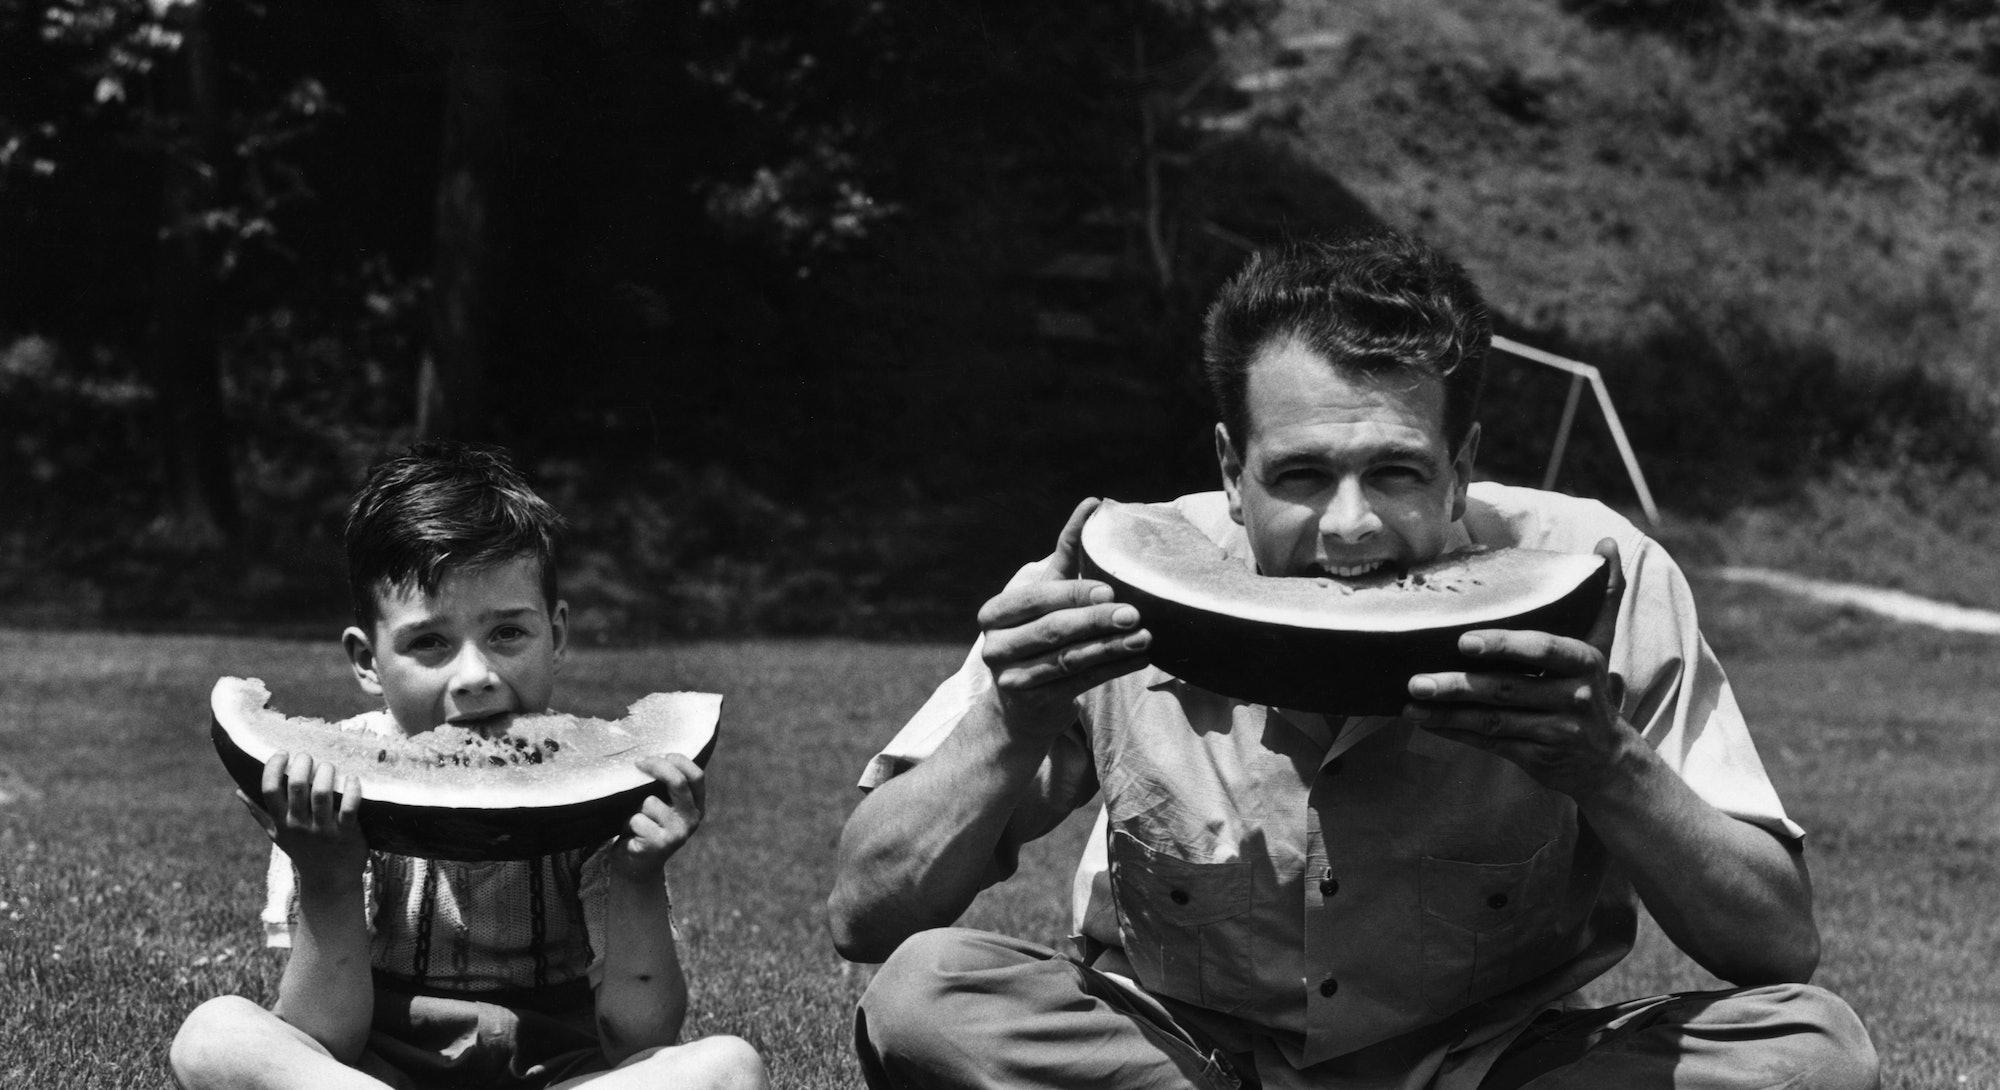 man and boy eat watermelon